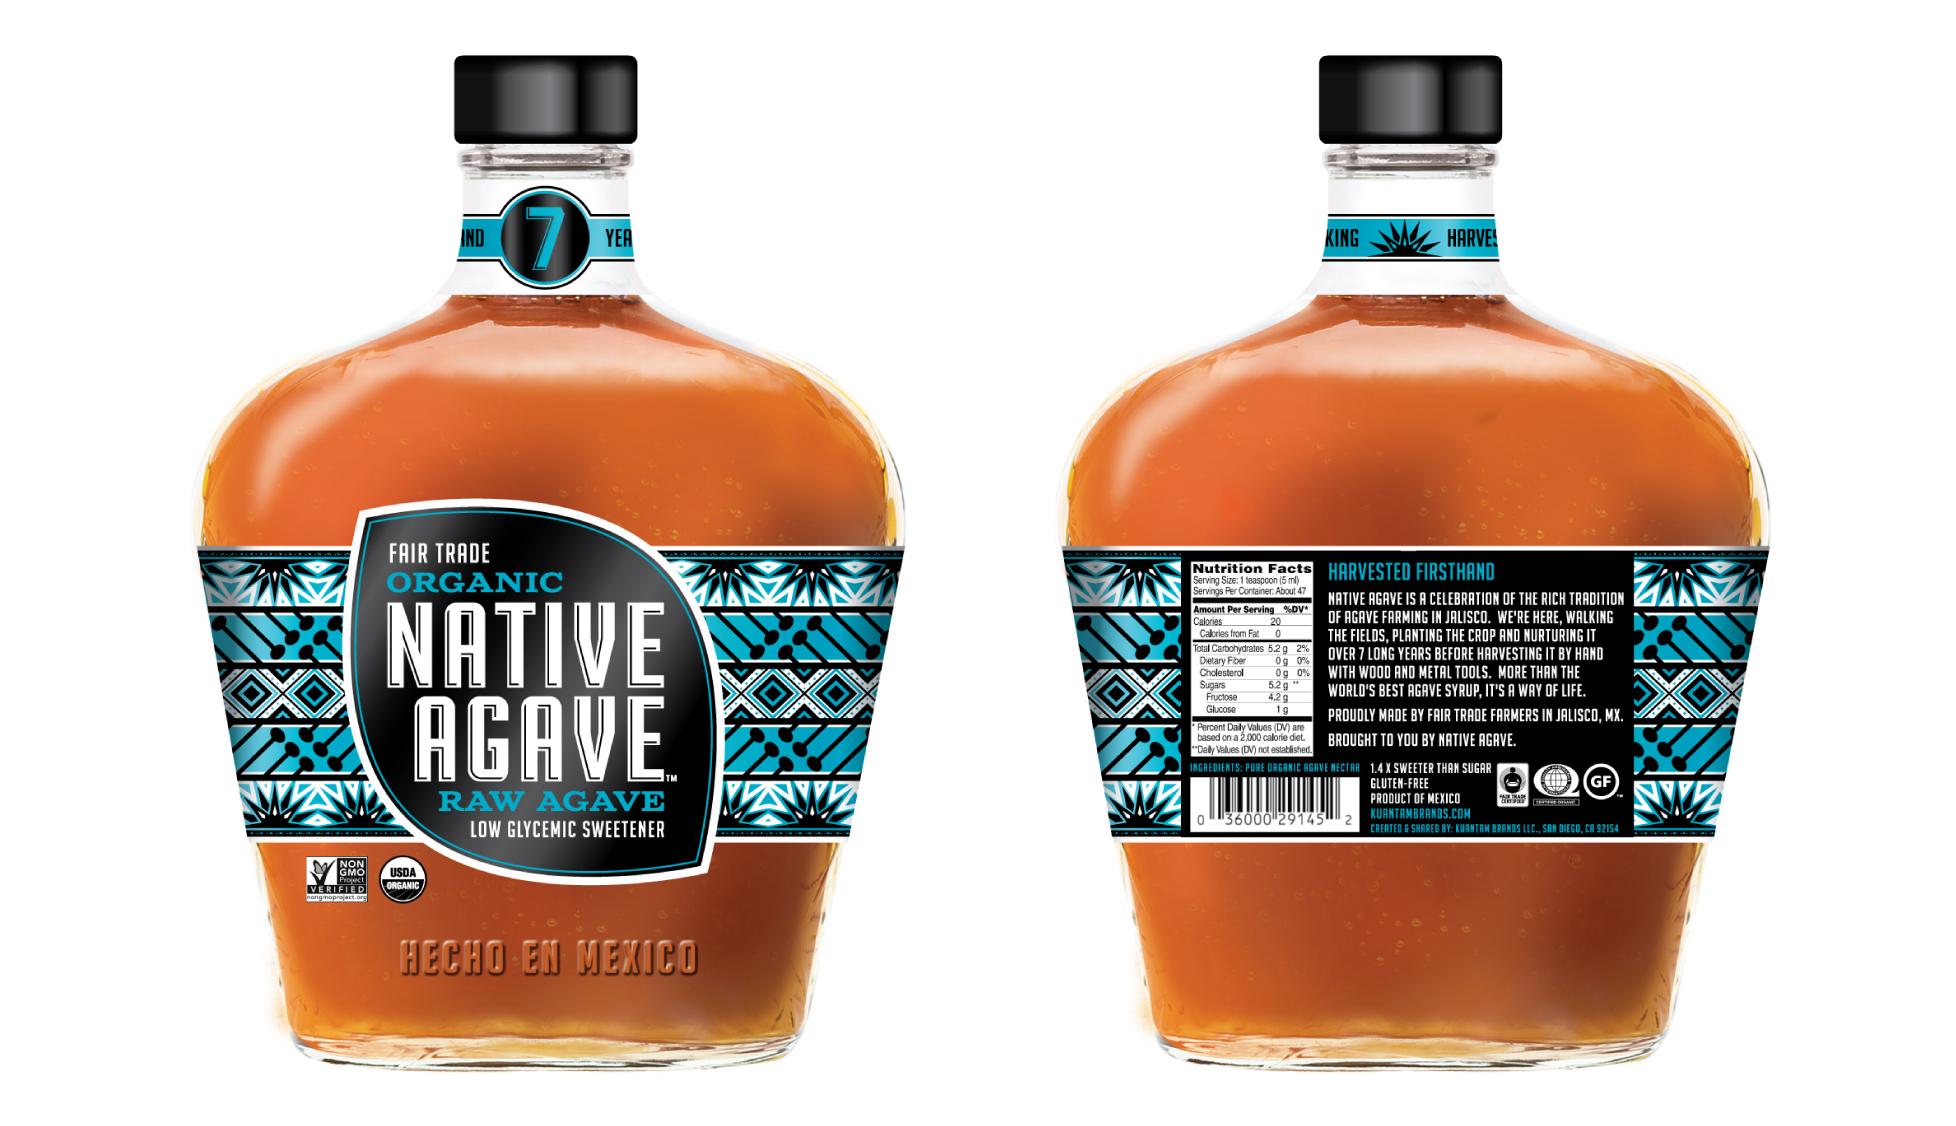 C&P_website_NativeAgave_Bottles-05.jpg